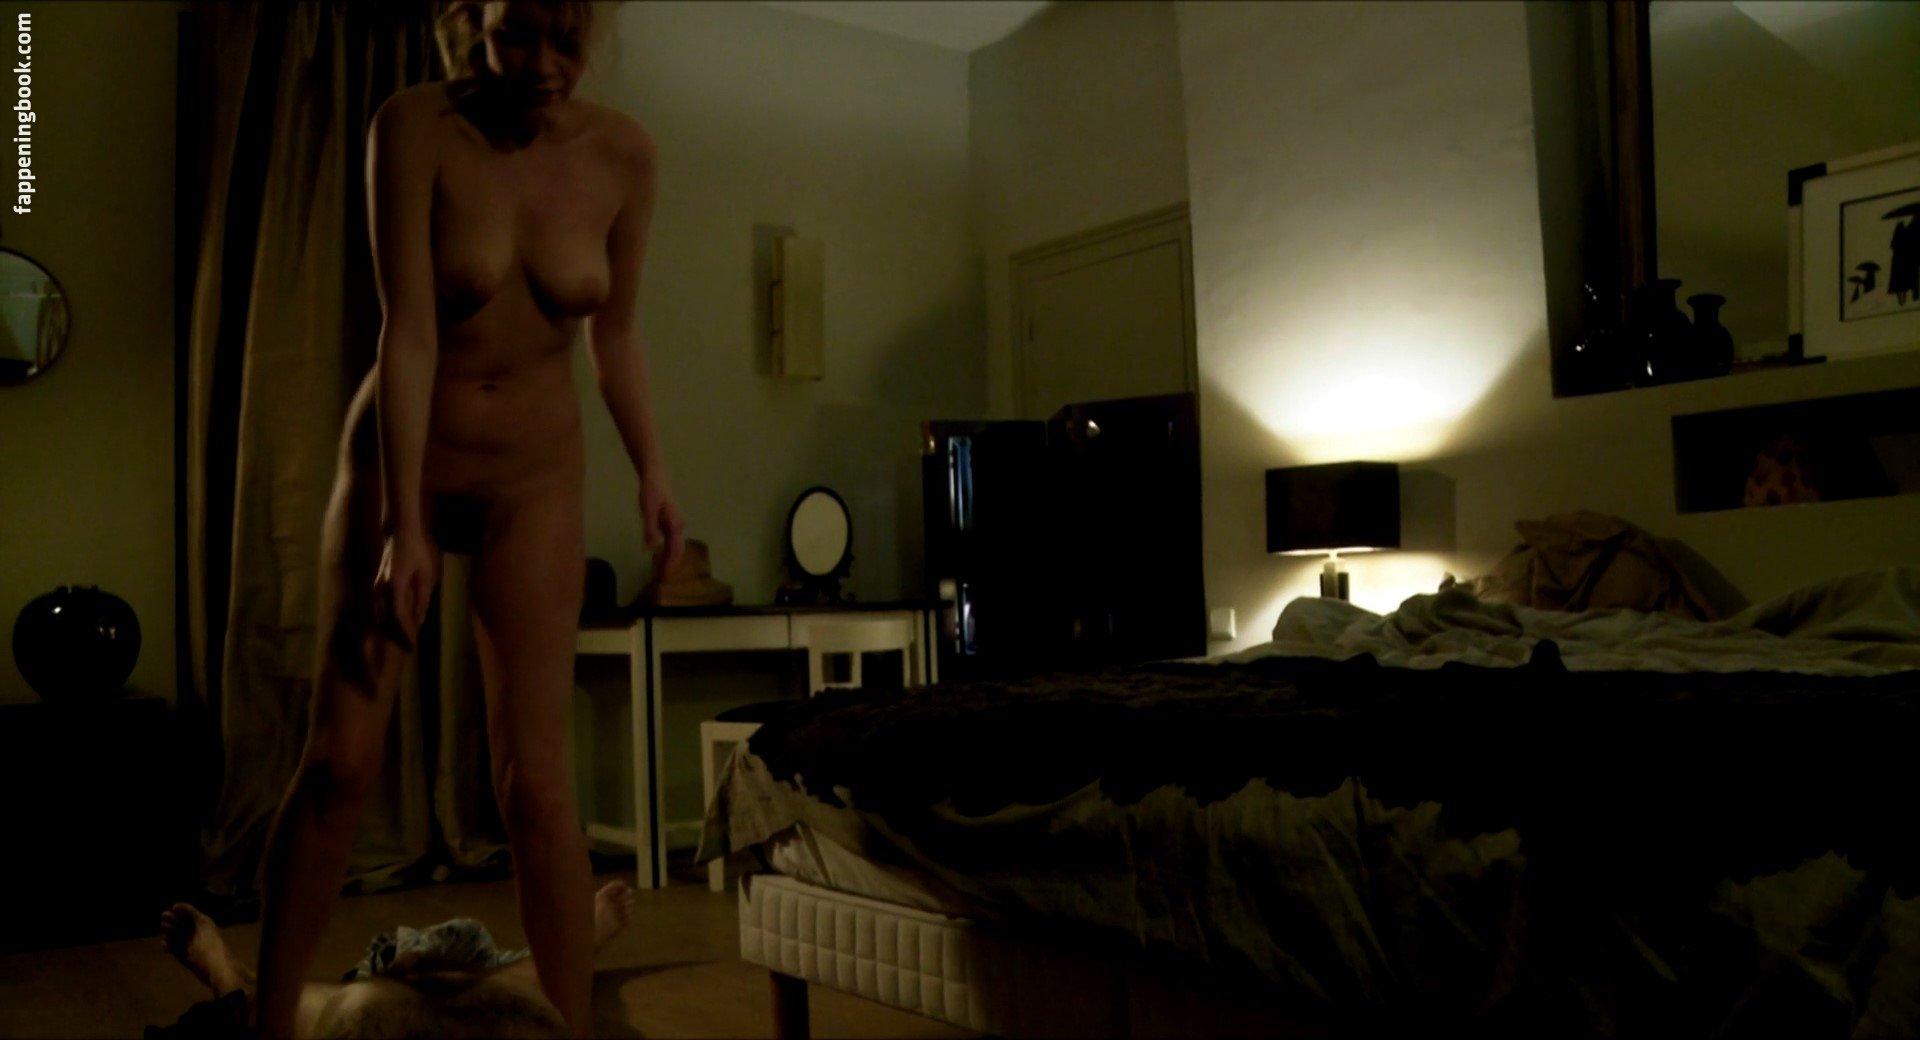 Nackt  Chantal Akerman The last